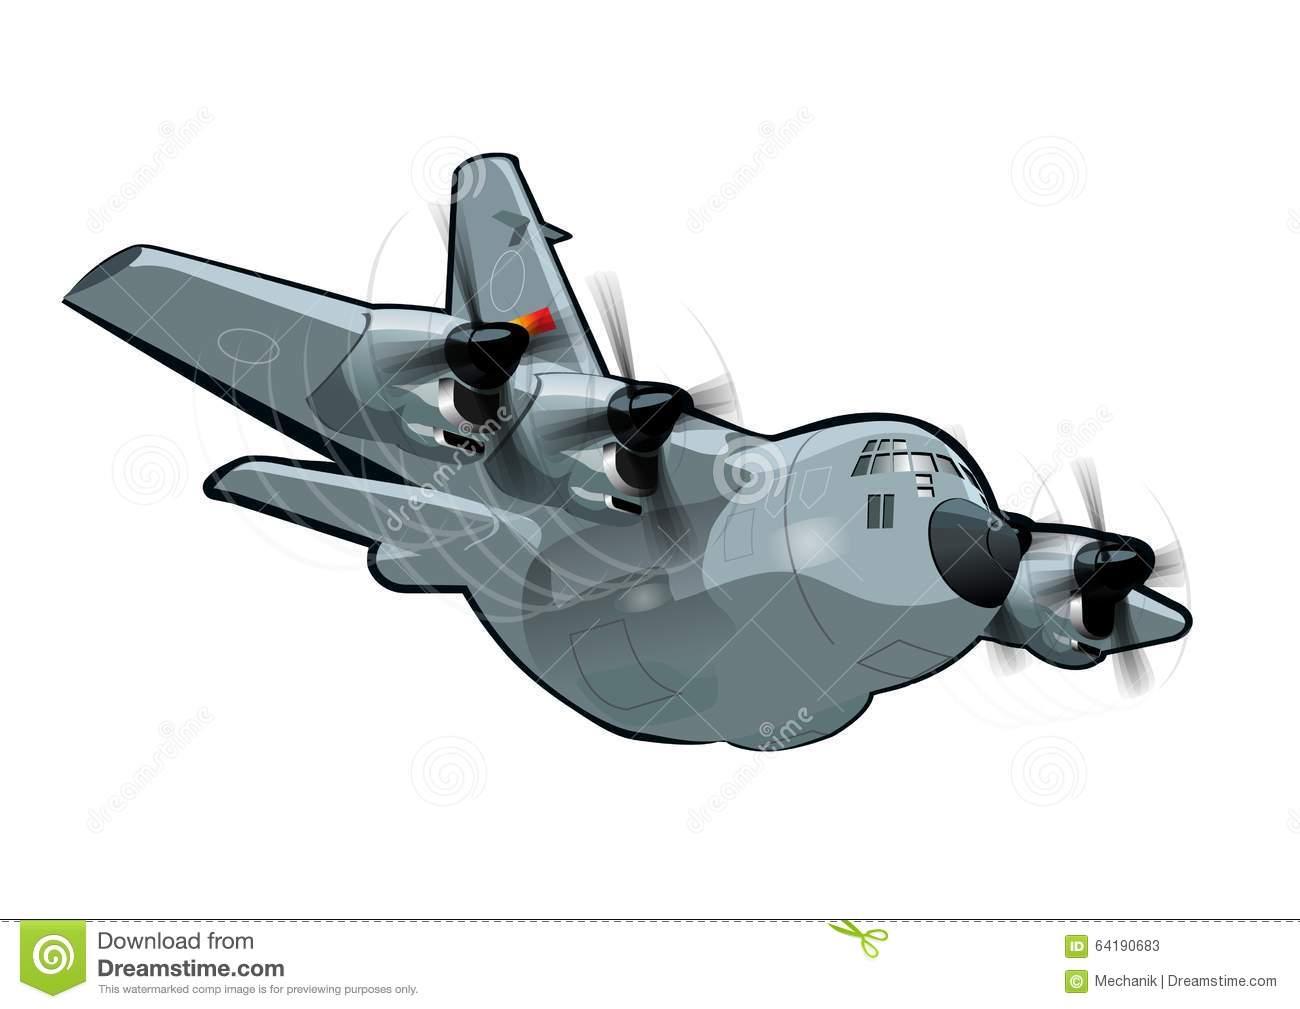 C-130j hercules clipart - Clipground